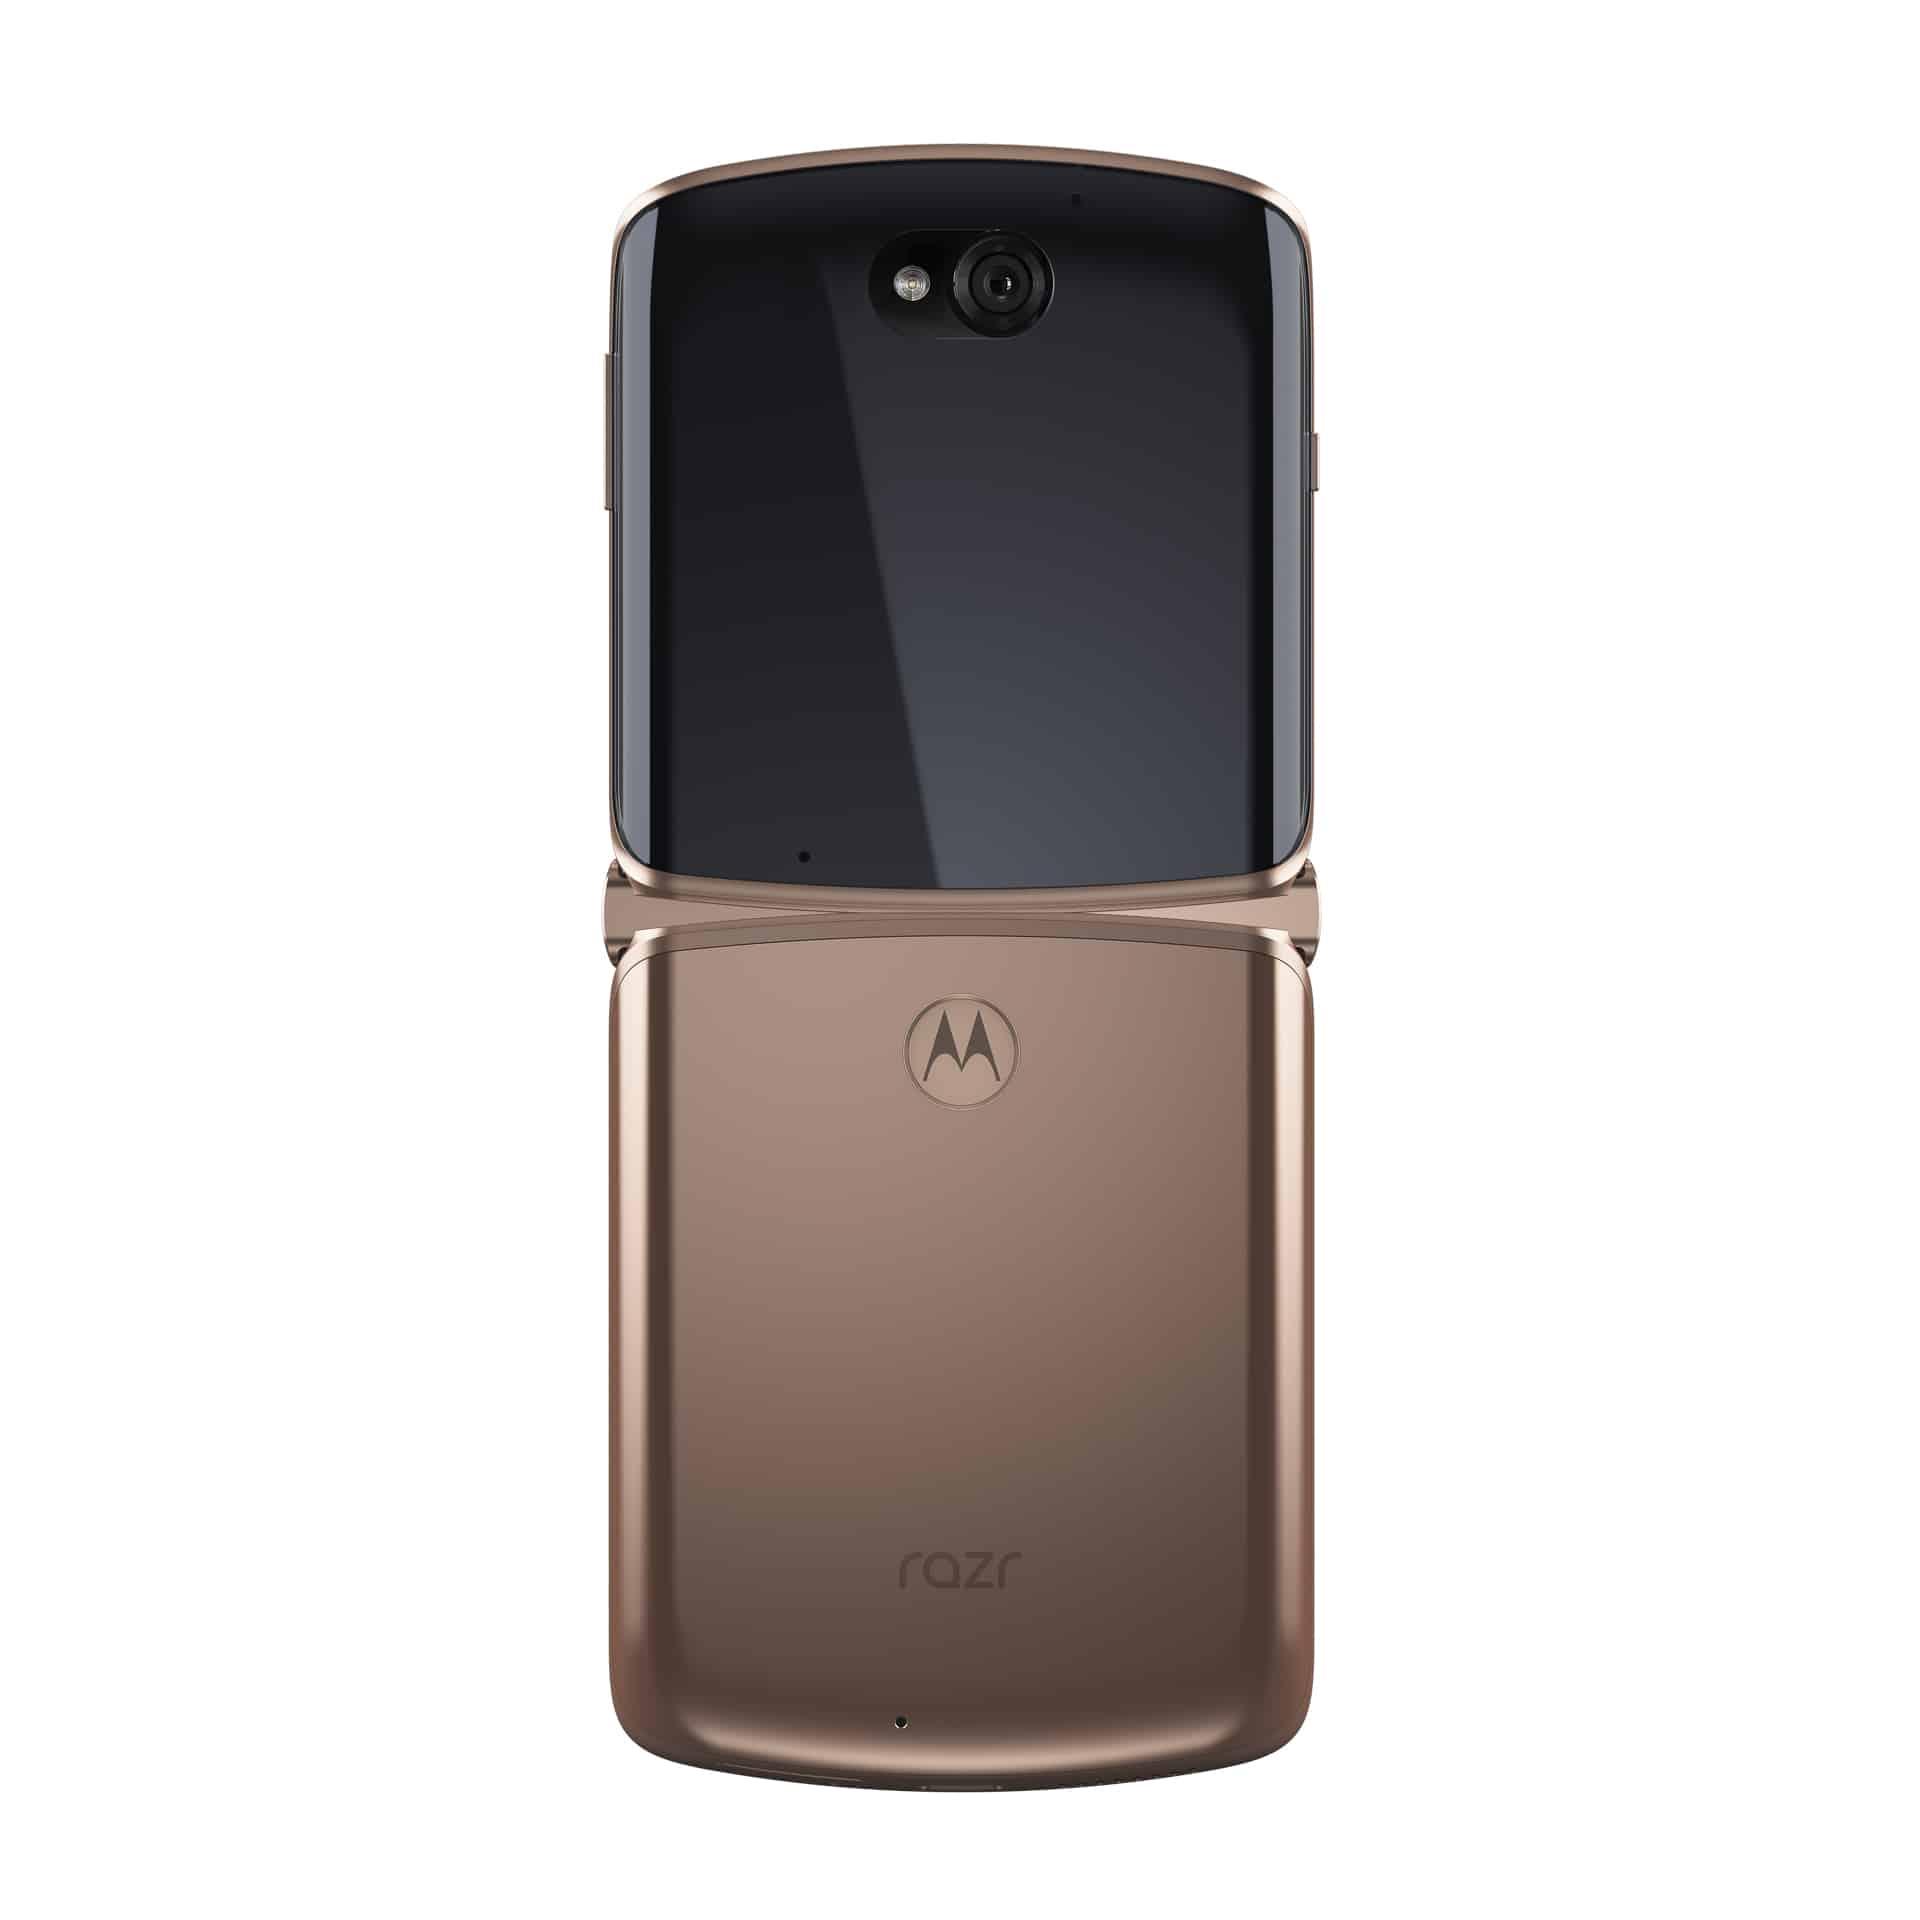 Motorola razr 5g AH 11